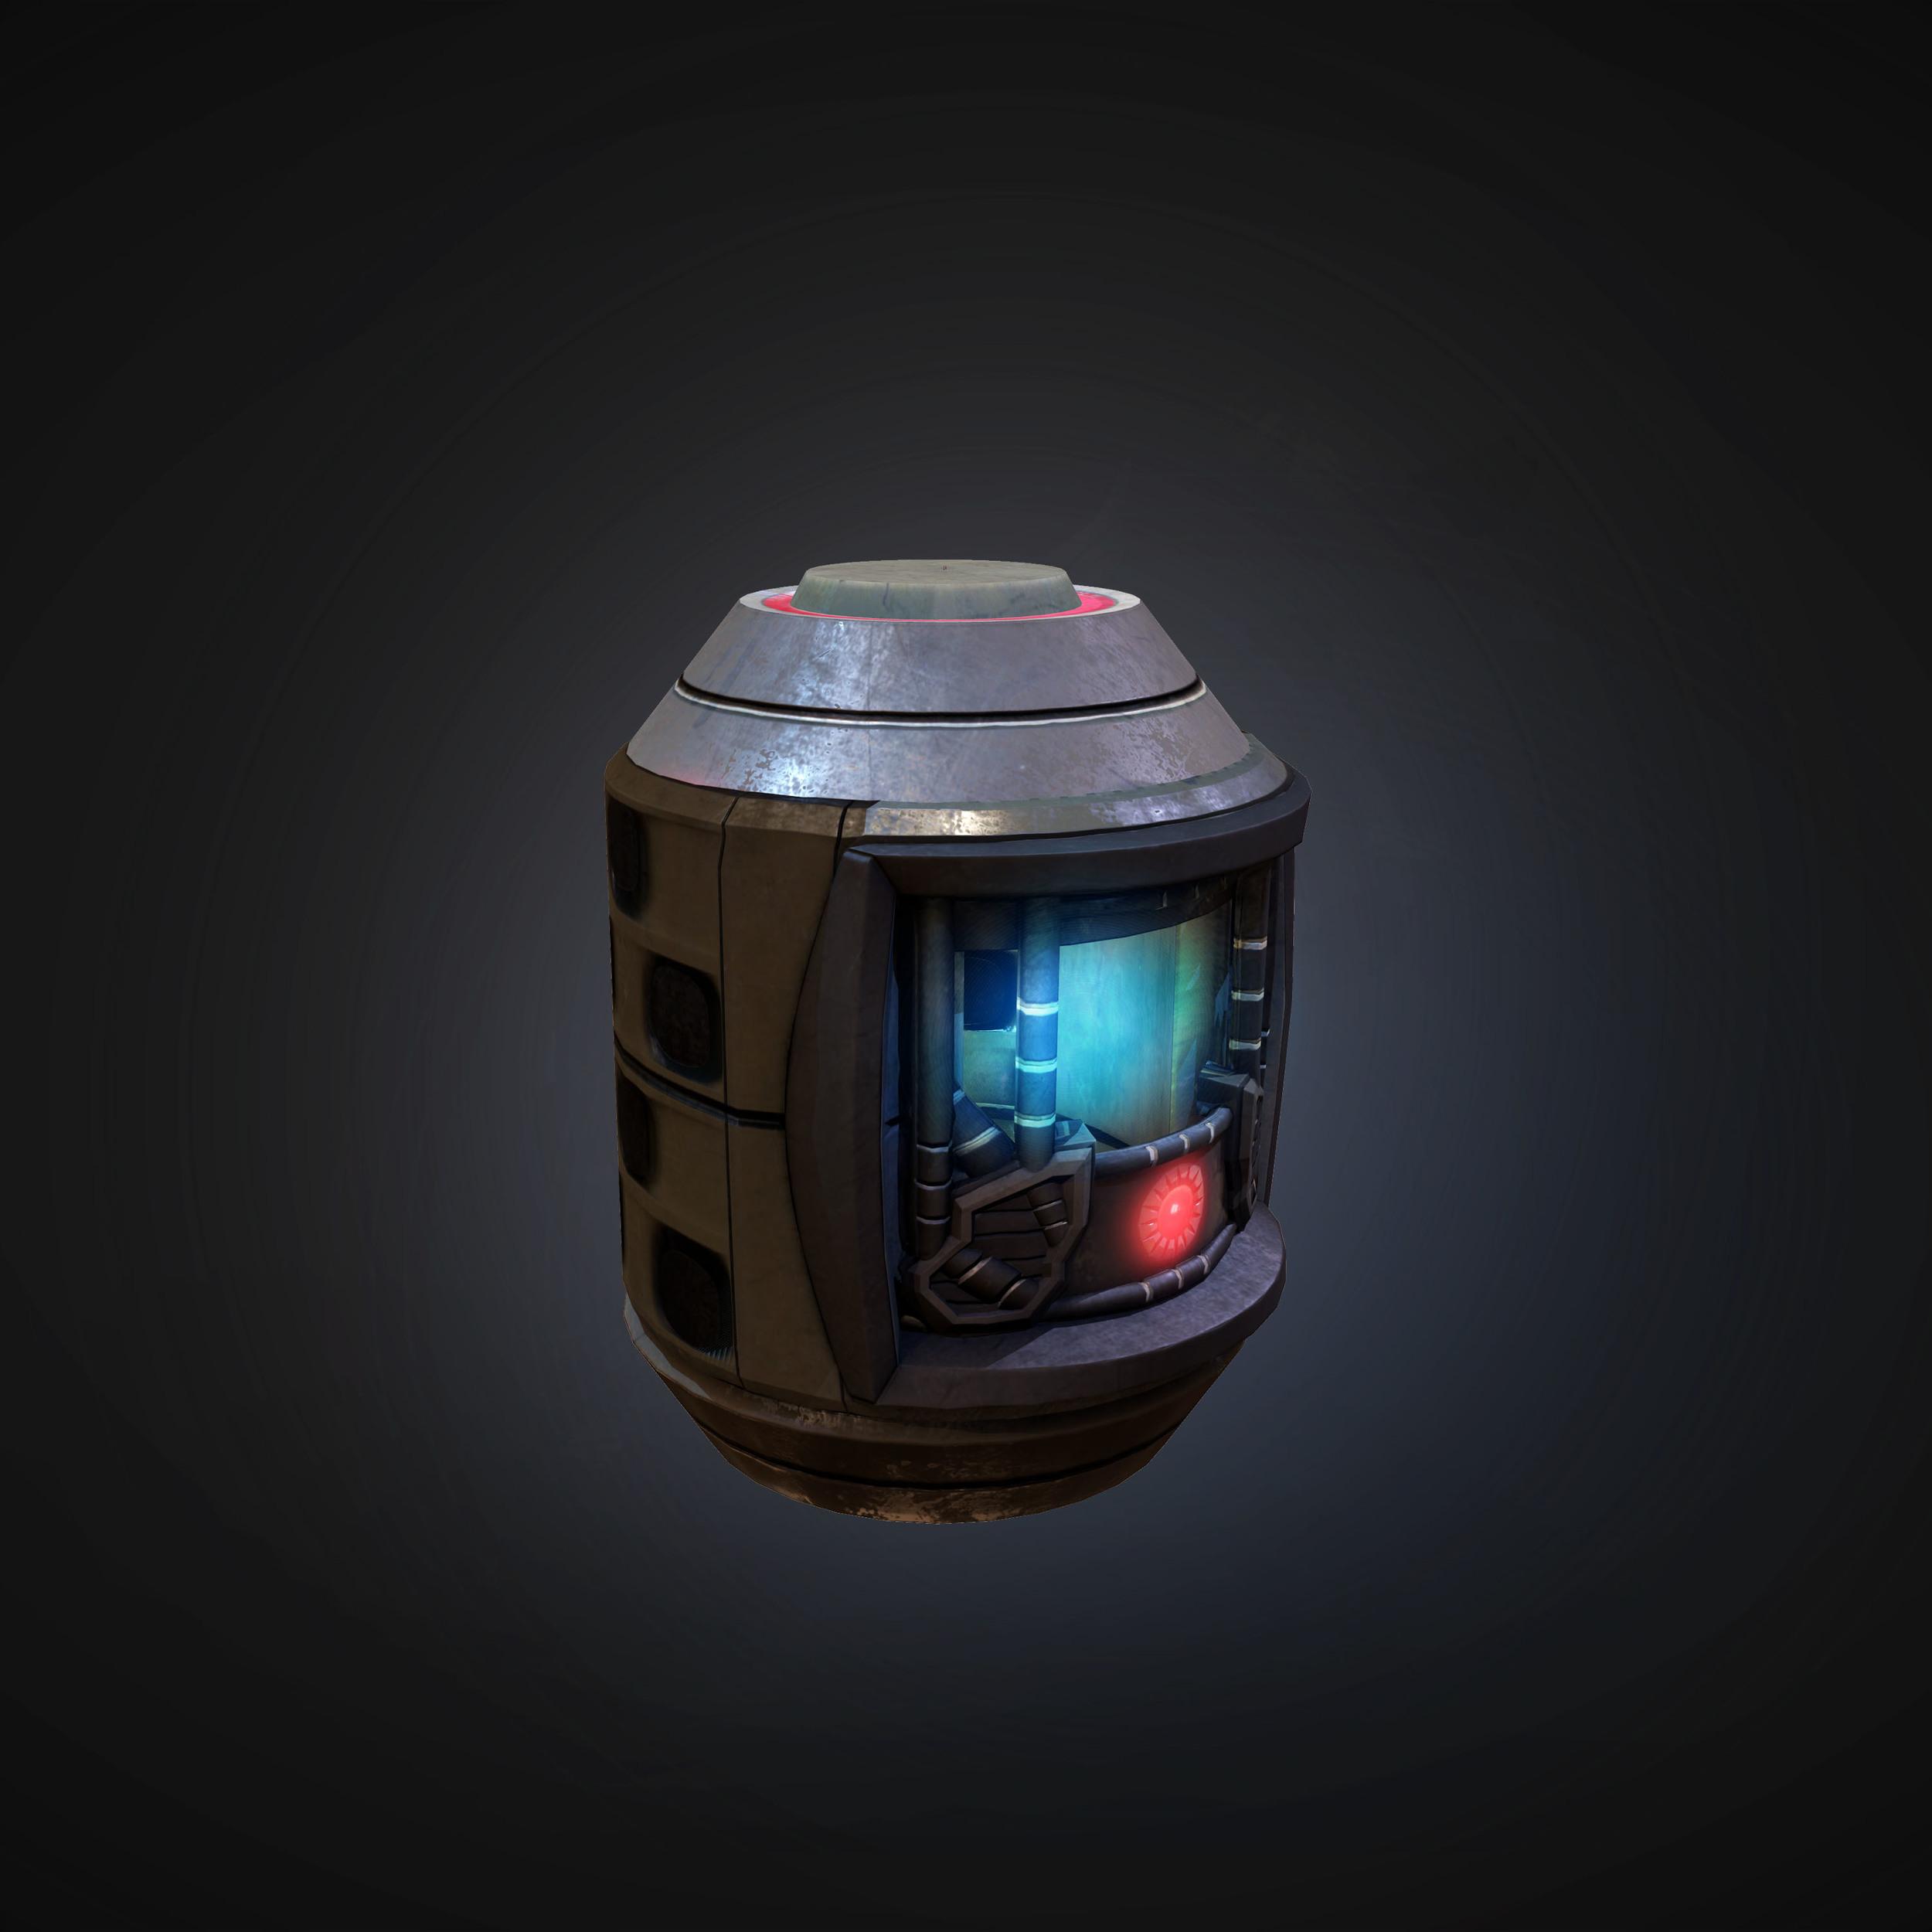 Grenade_Lowpoly_Angle_END.jpg